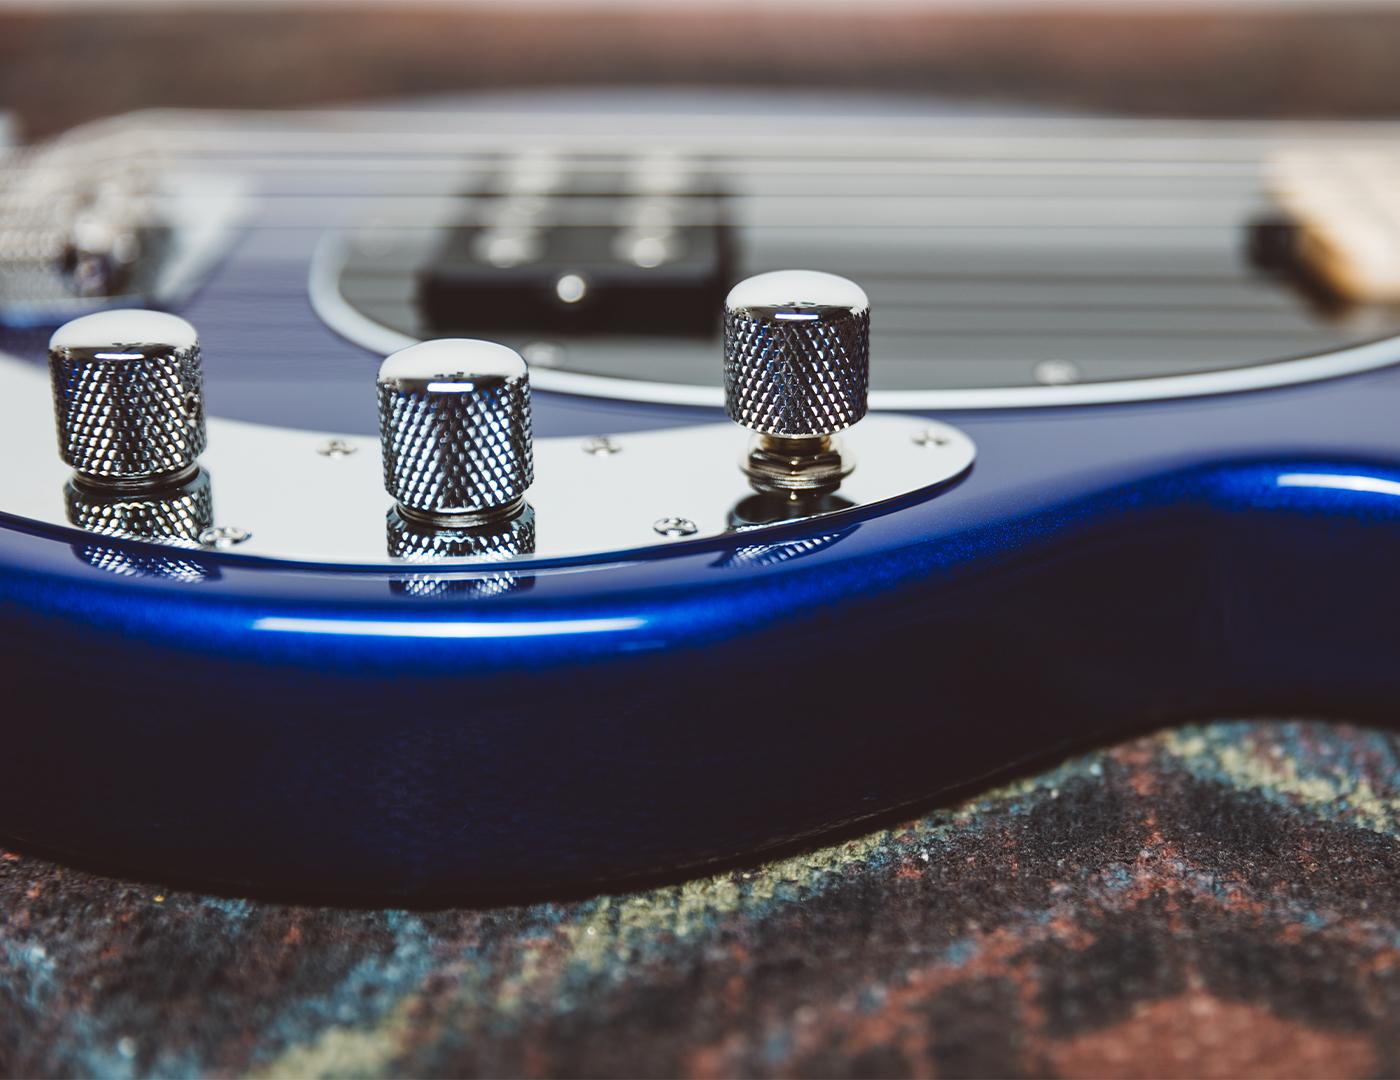 SS-StingRay-Bass-social-assets-Carousel-blue-2.jpg